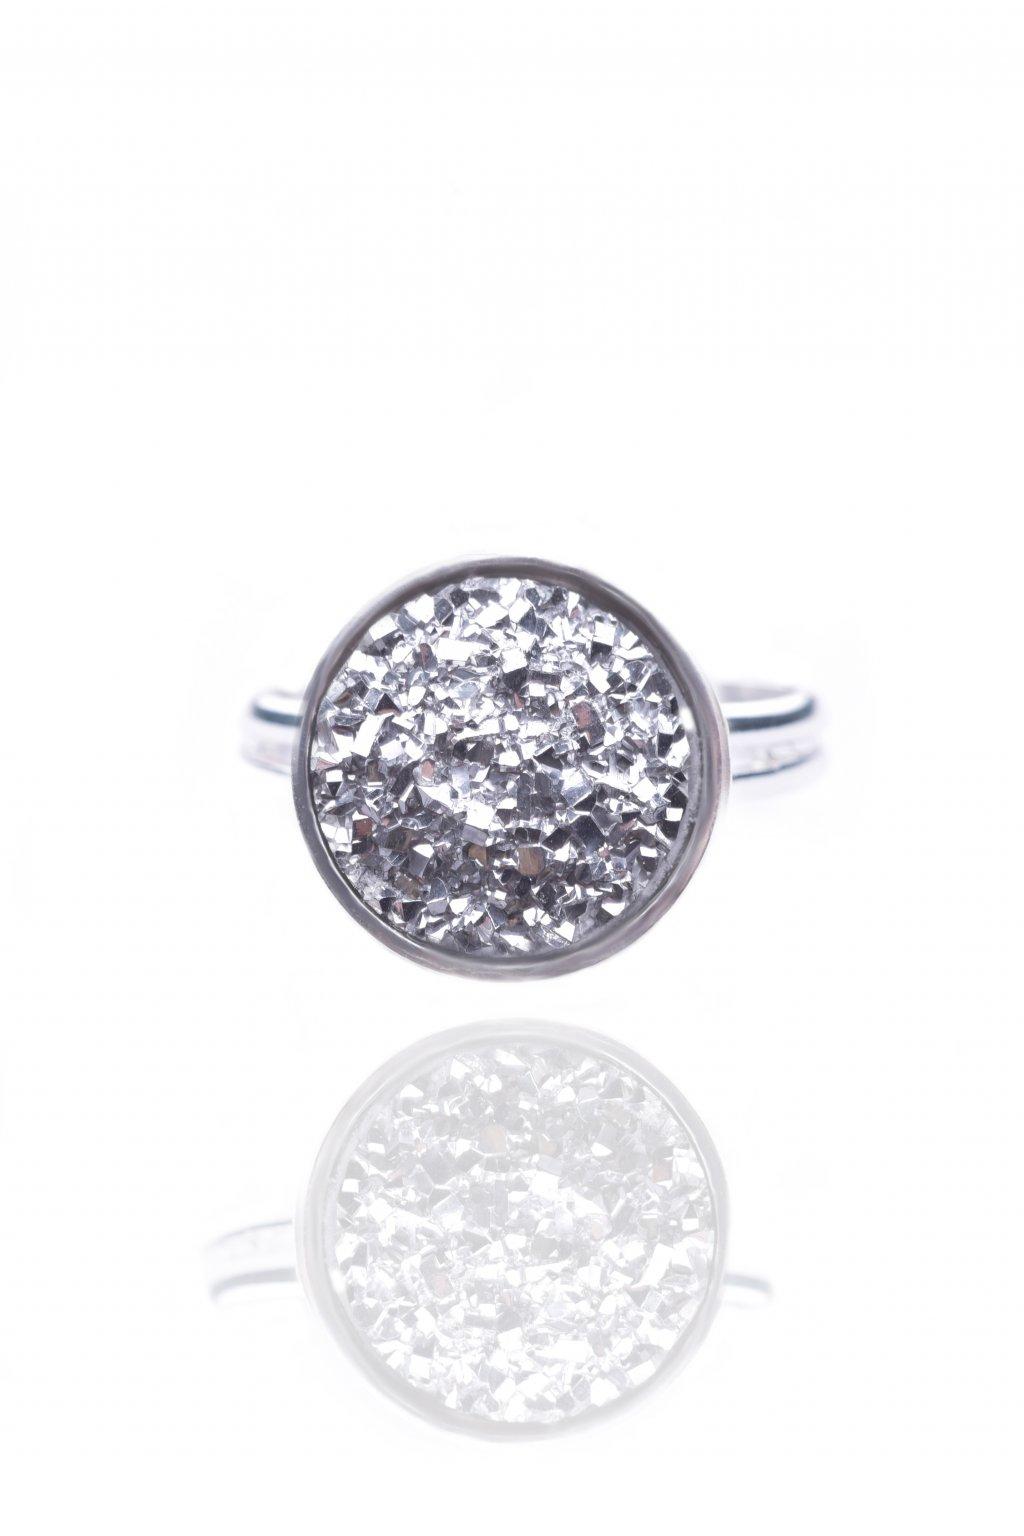 Prsten silver Dragon eye (stříbrné dračí oko)